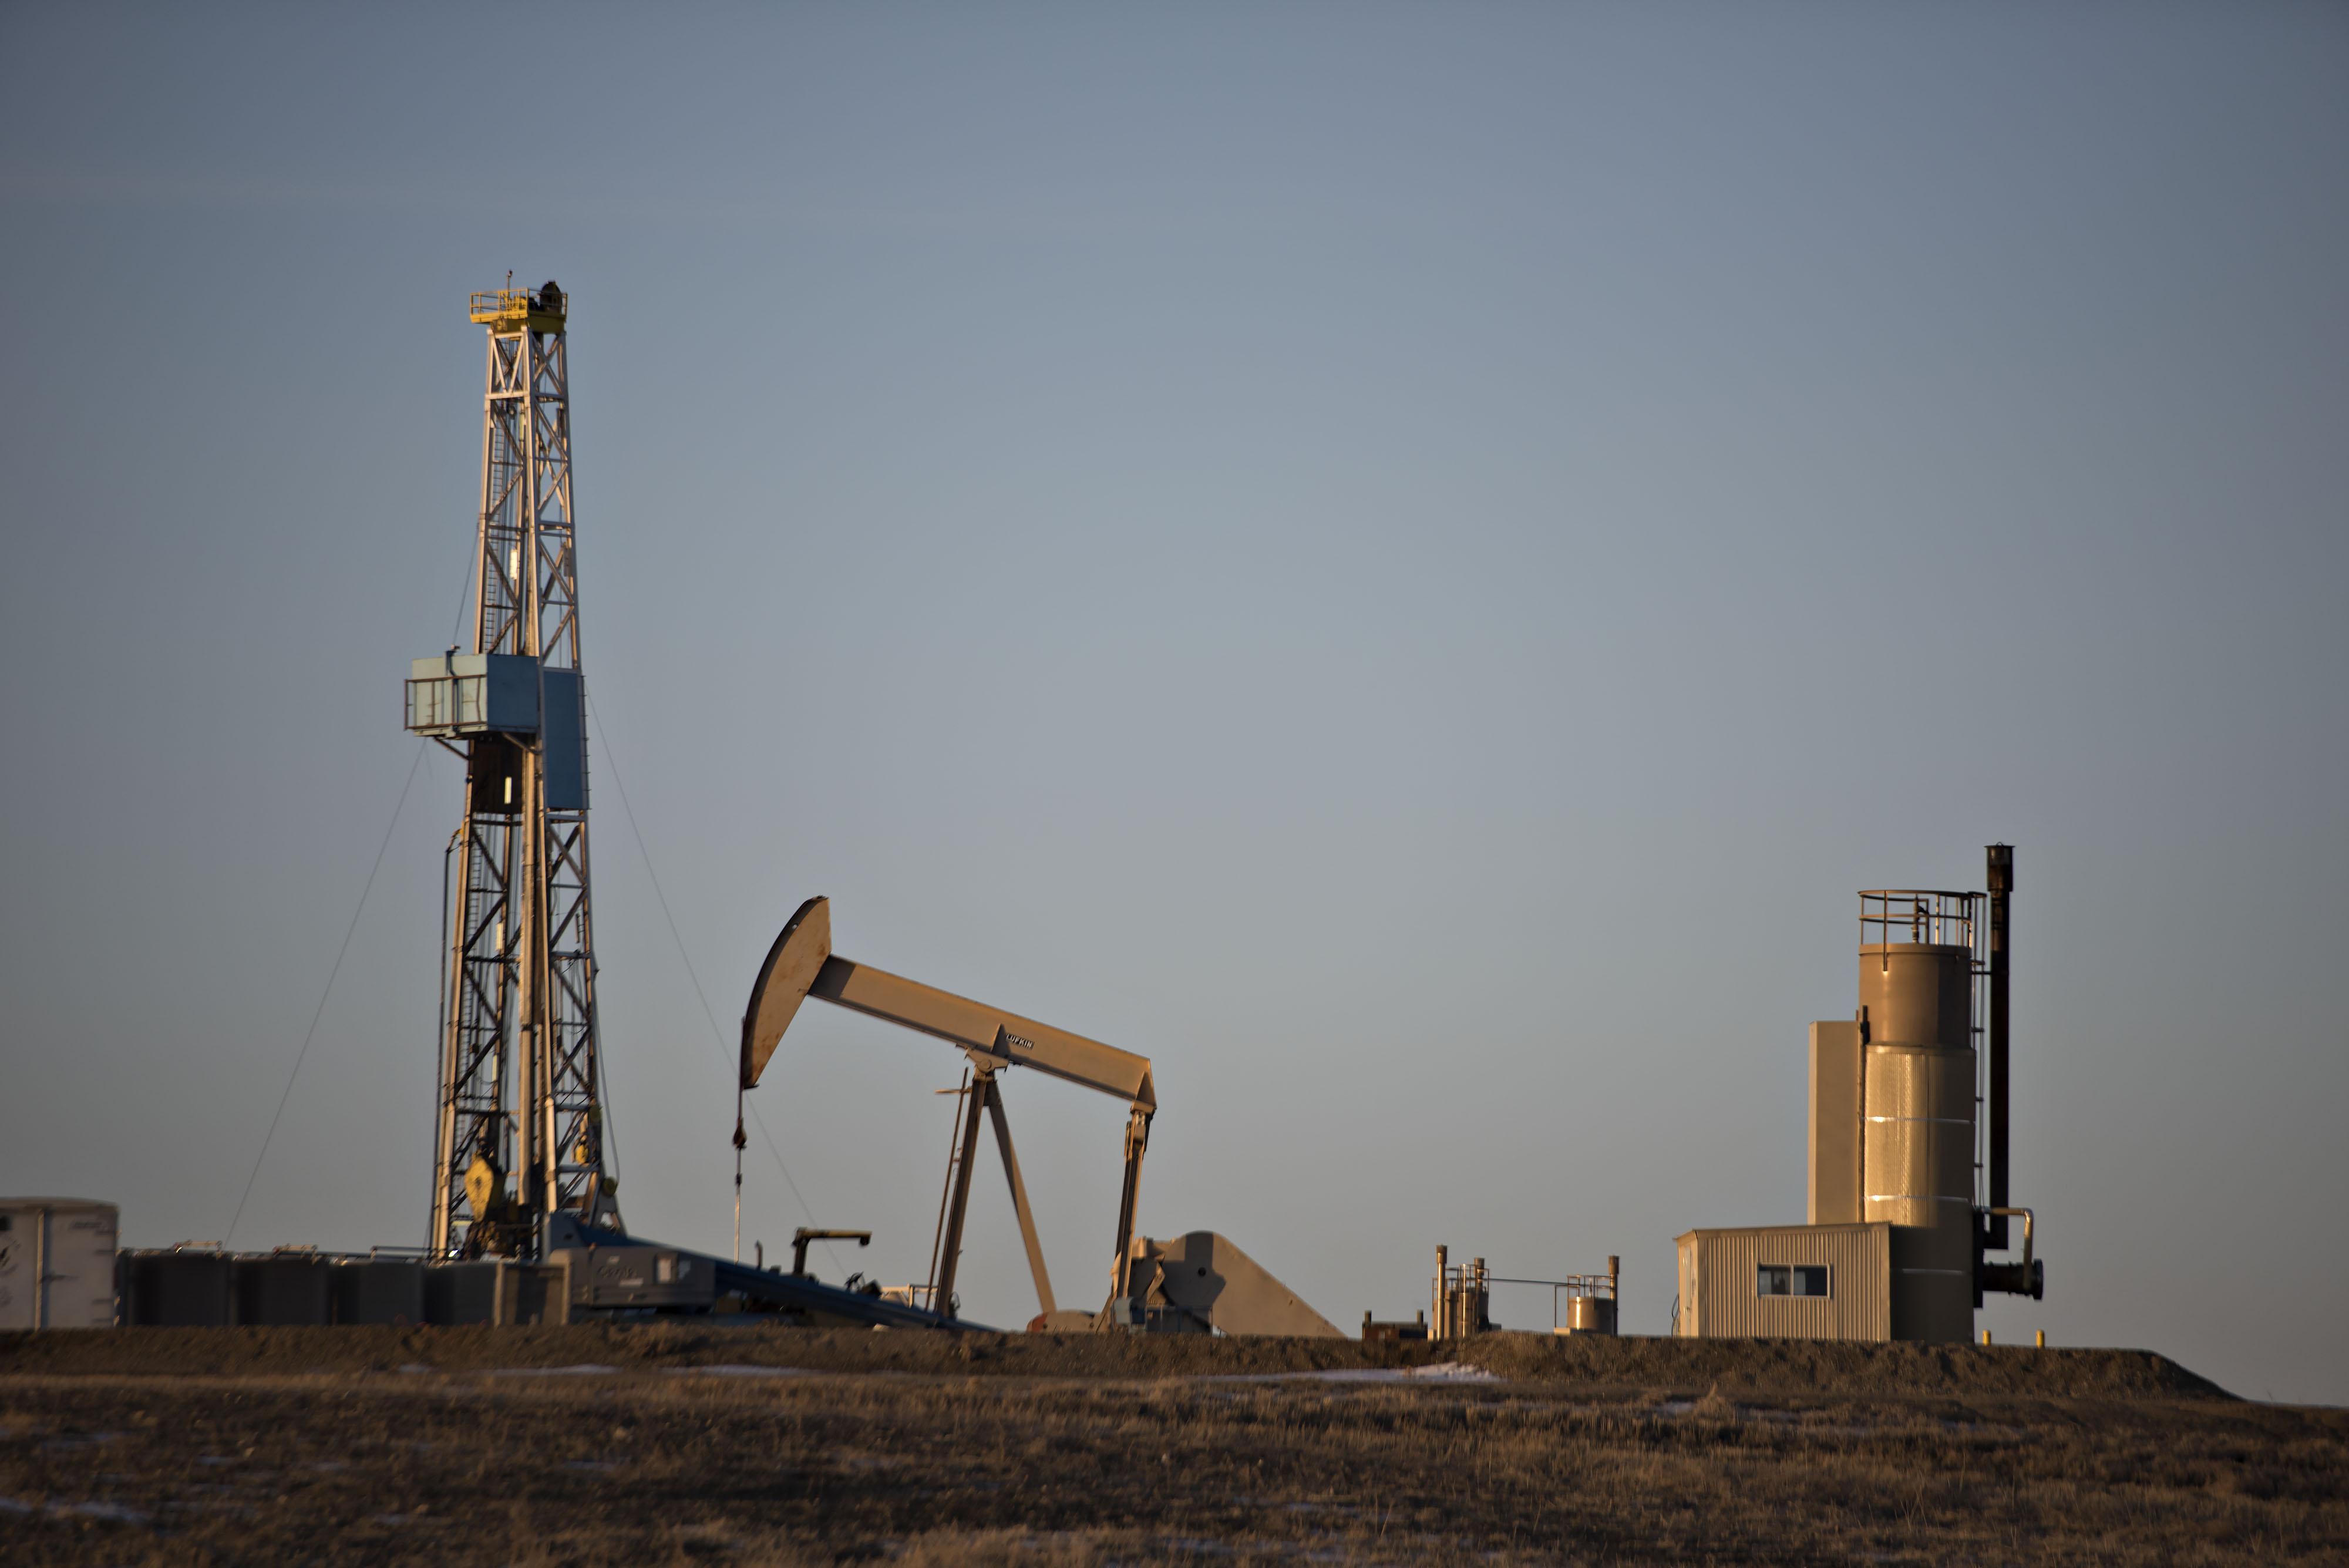 No Bust Seen As Dakota Oil Firms Keep Staff Amid Price Drop